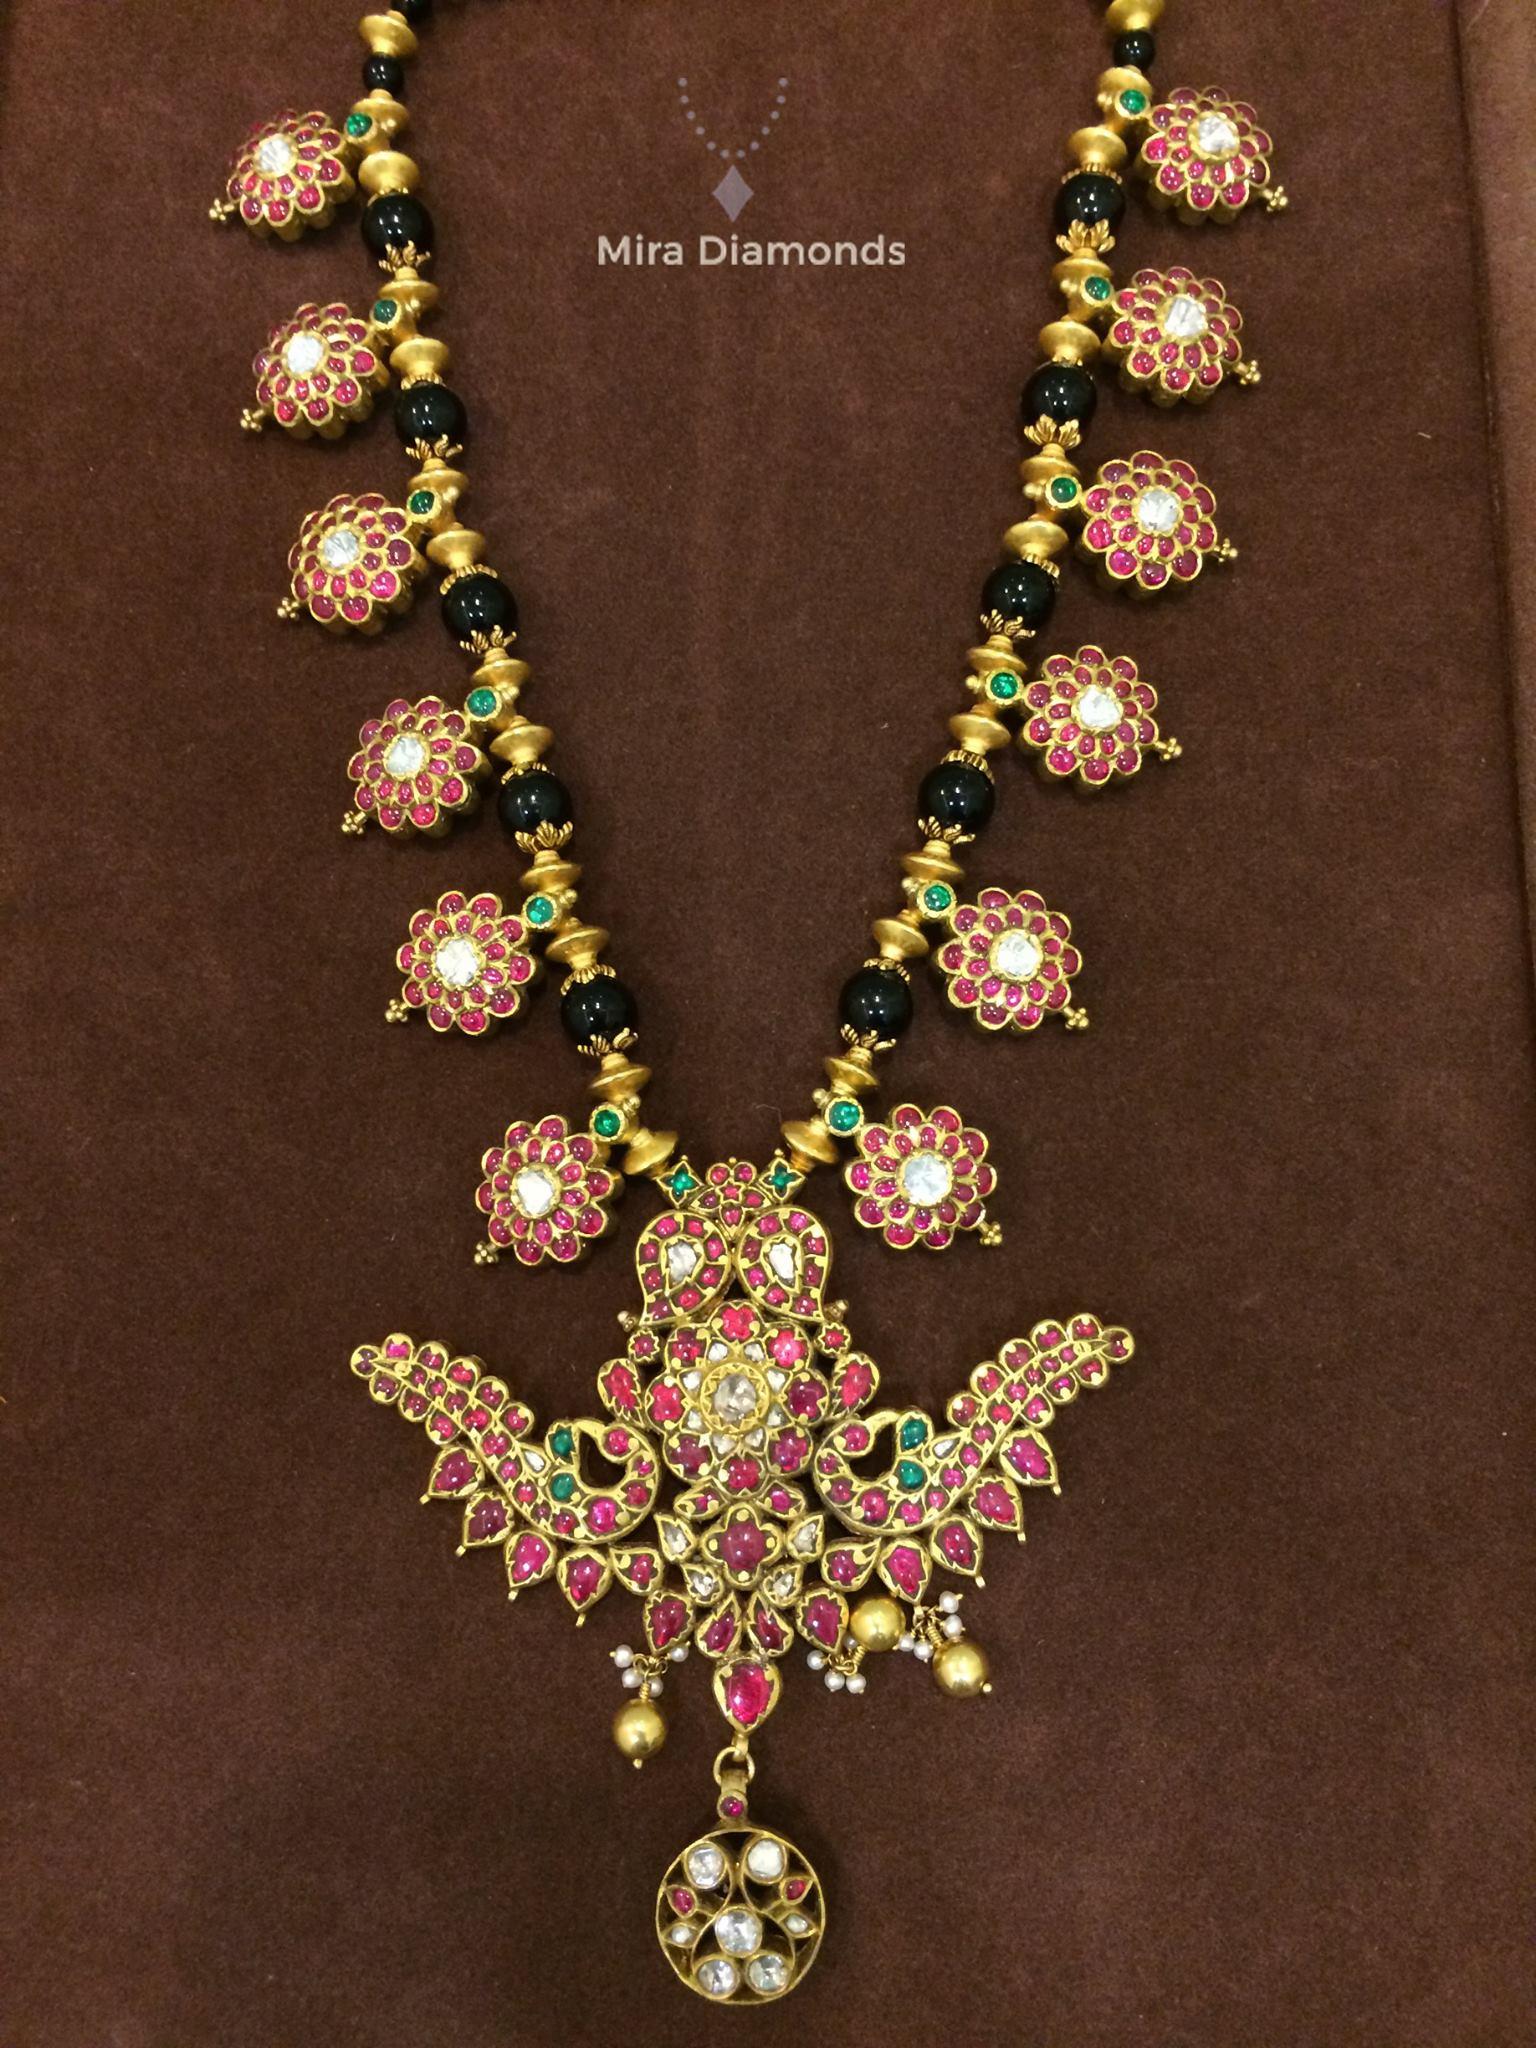 Black Beads Ruby Pendants Necklace from Mira Diamonds